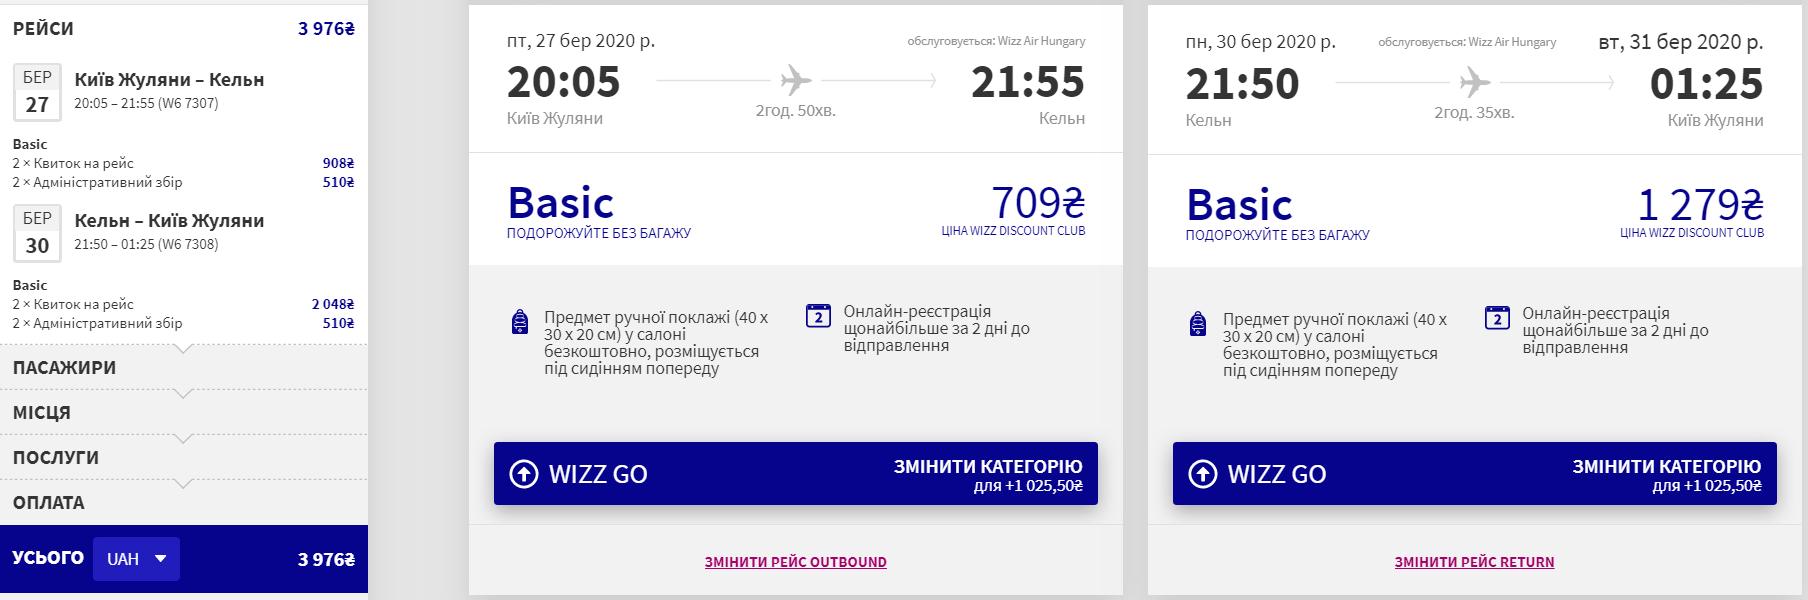 Київ - Кельн - Київ >>